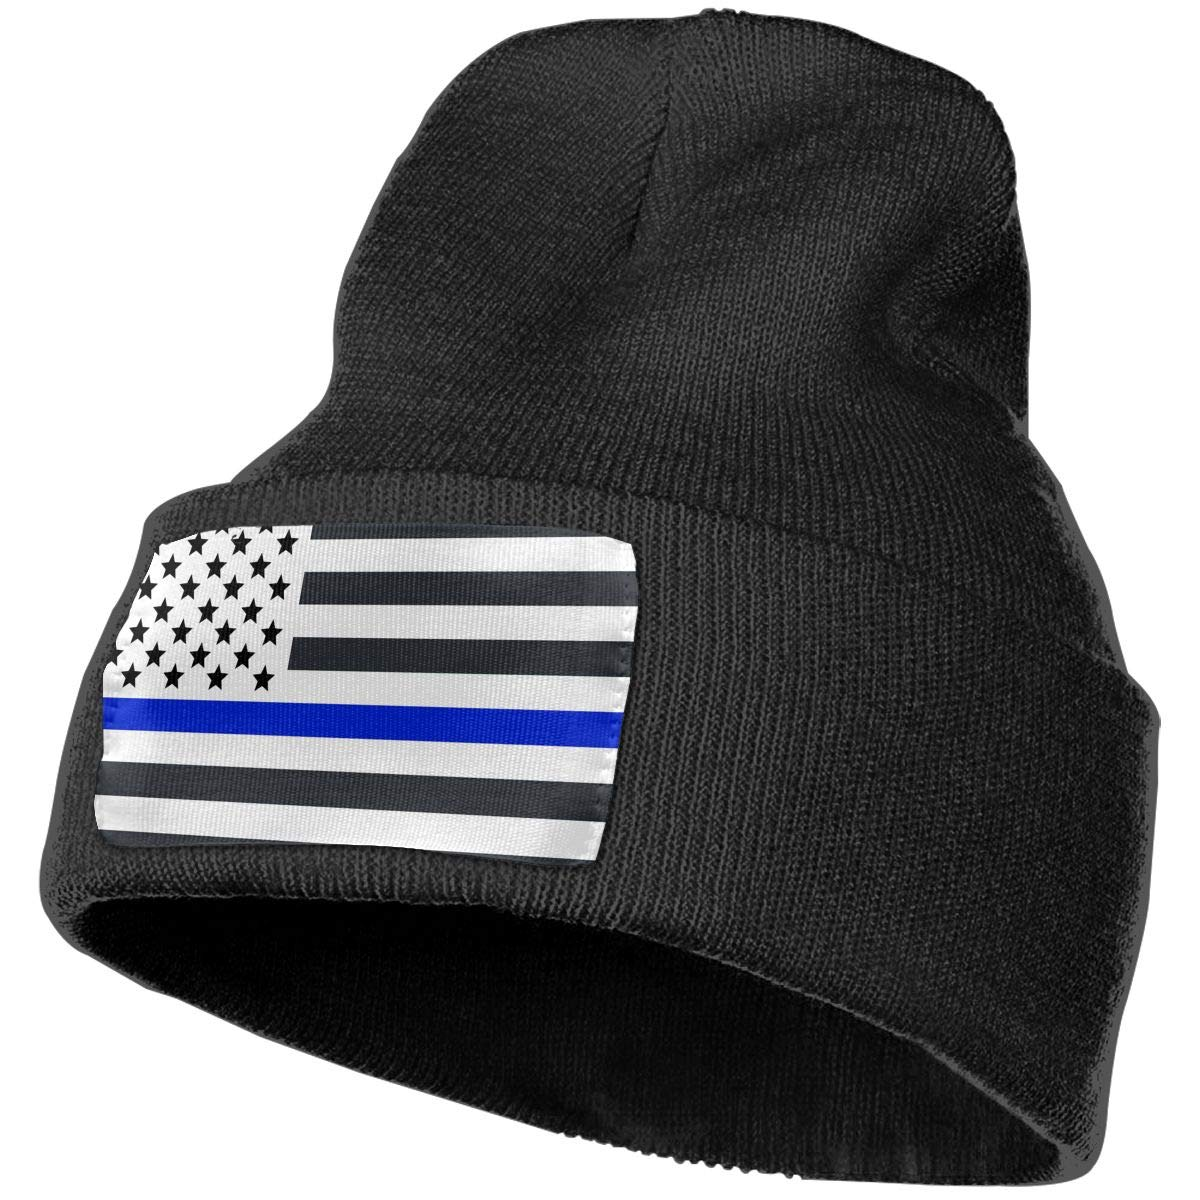 Field Rain Blue Line Unisex 100/% Acrylic Knit Hat Cap Rider Soft Beanie Hat Woolen Hat